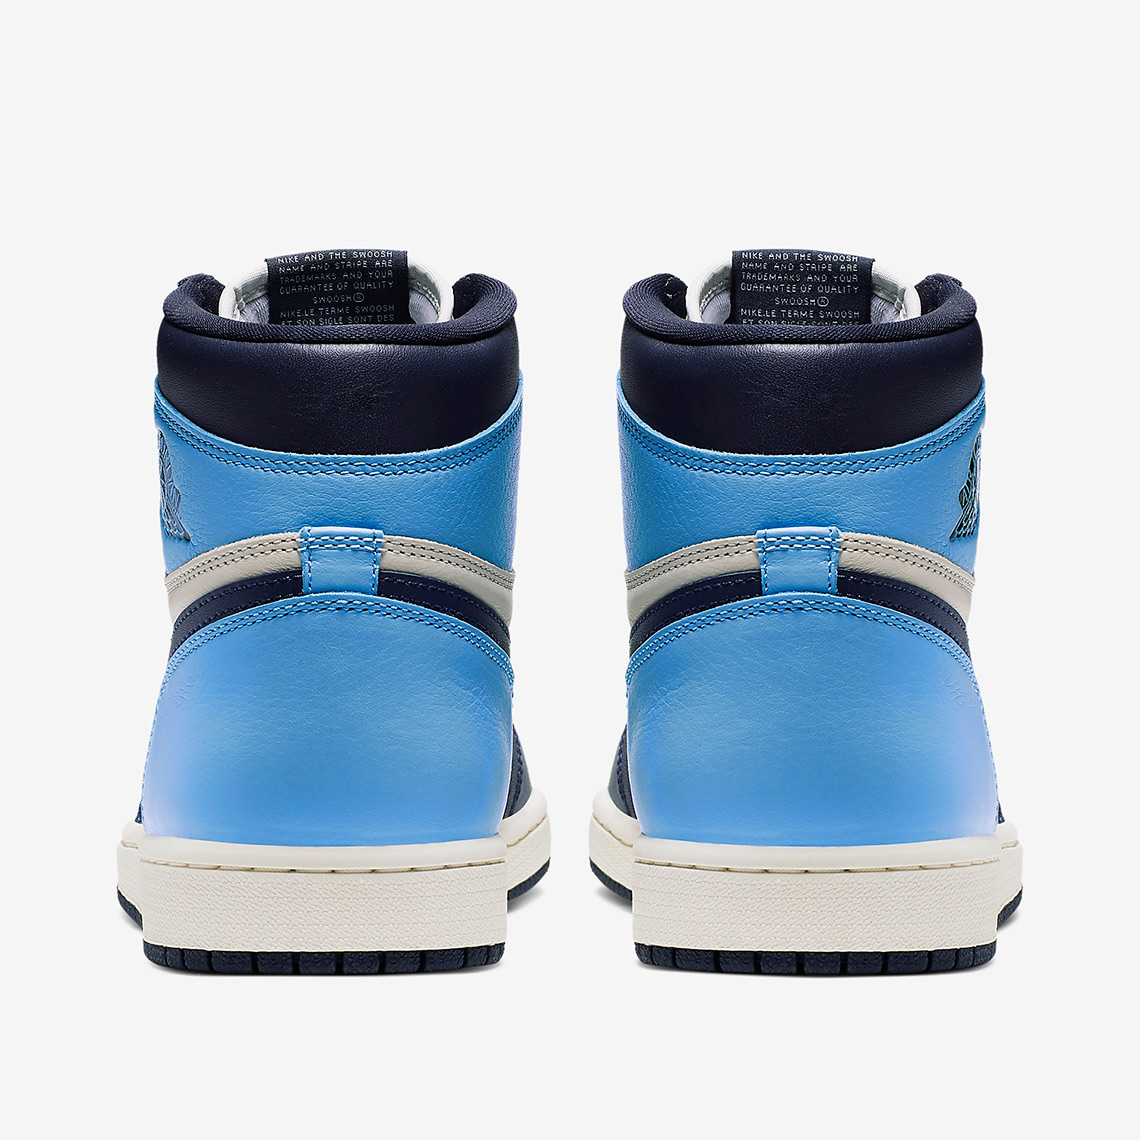 Air Jordan 1 Retro High OG Sail Obsidian University Blue ...